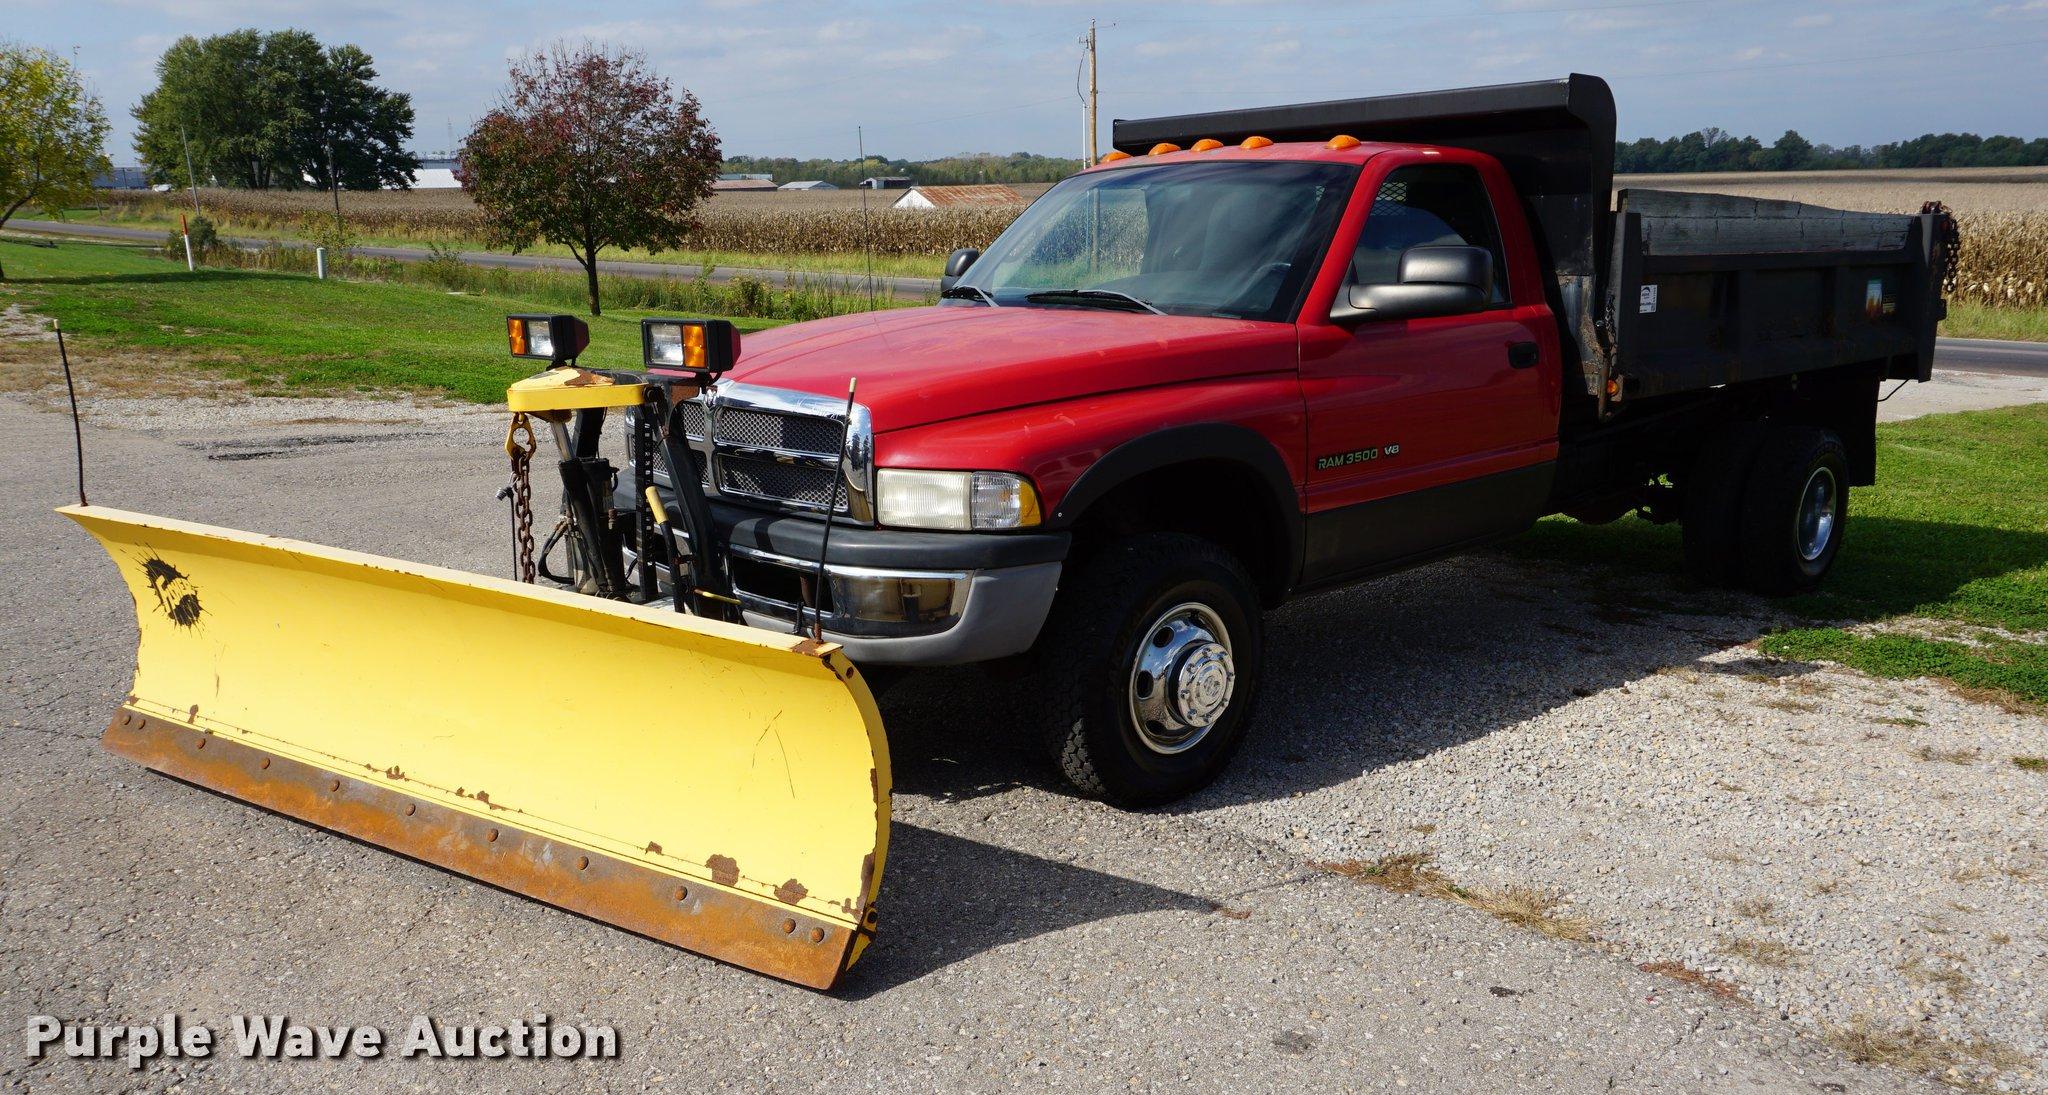 2001 Dodge Ram 3500 Dump Bed Pickup Truck Item Da1259 So Extended Cab Image For